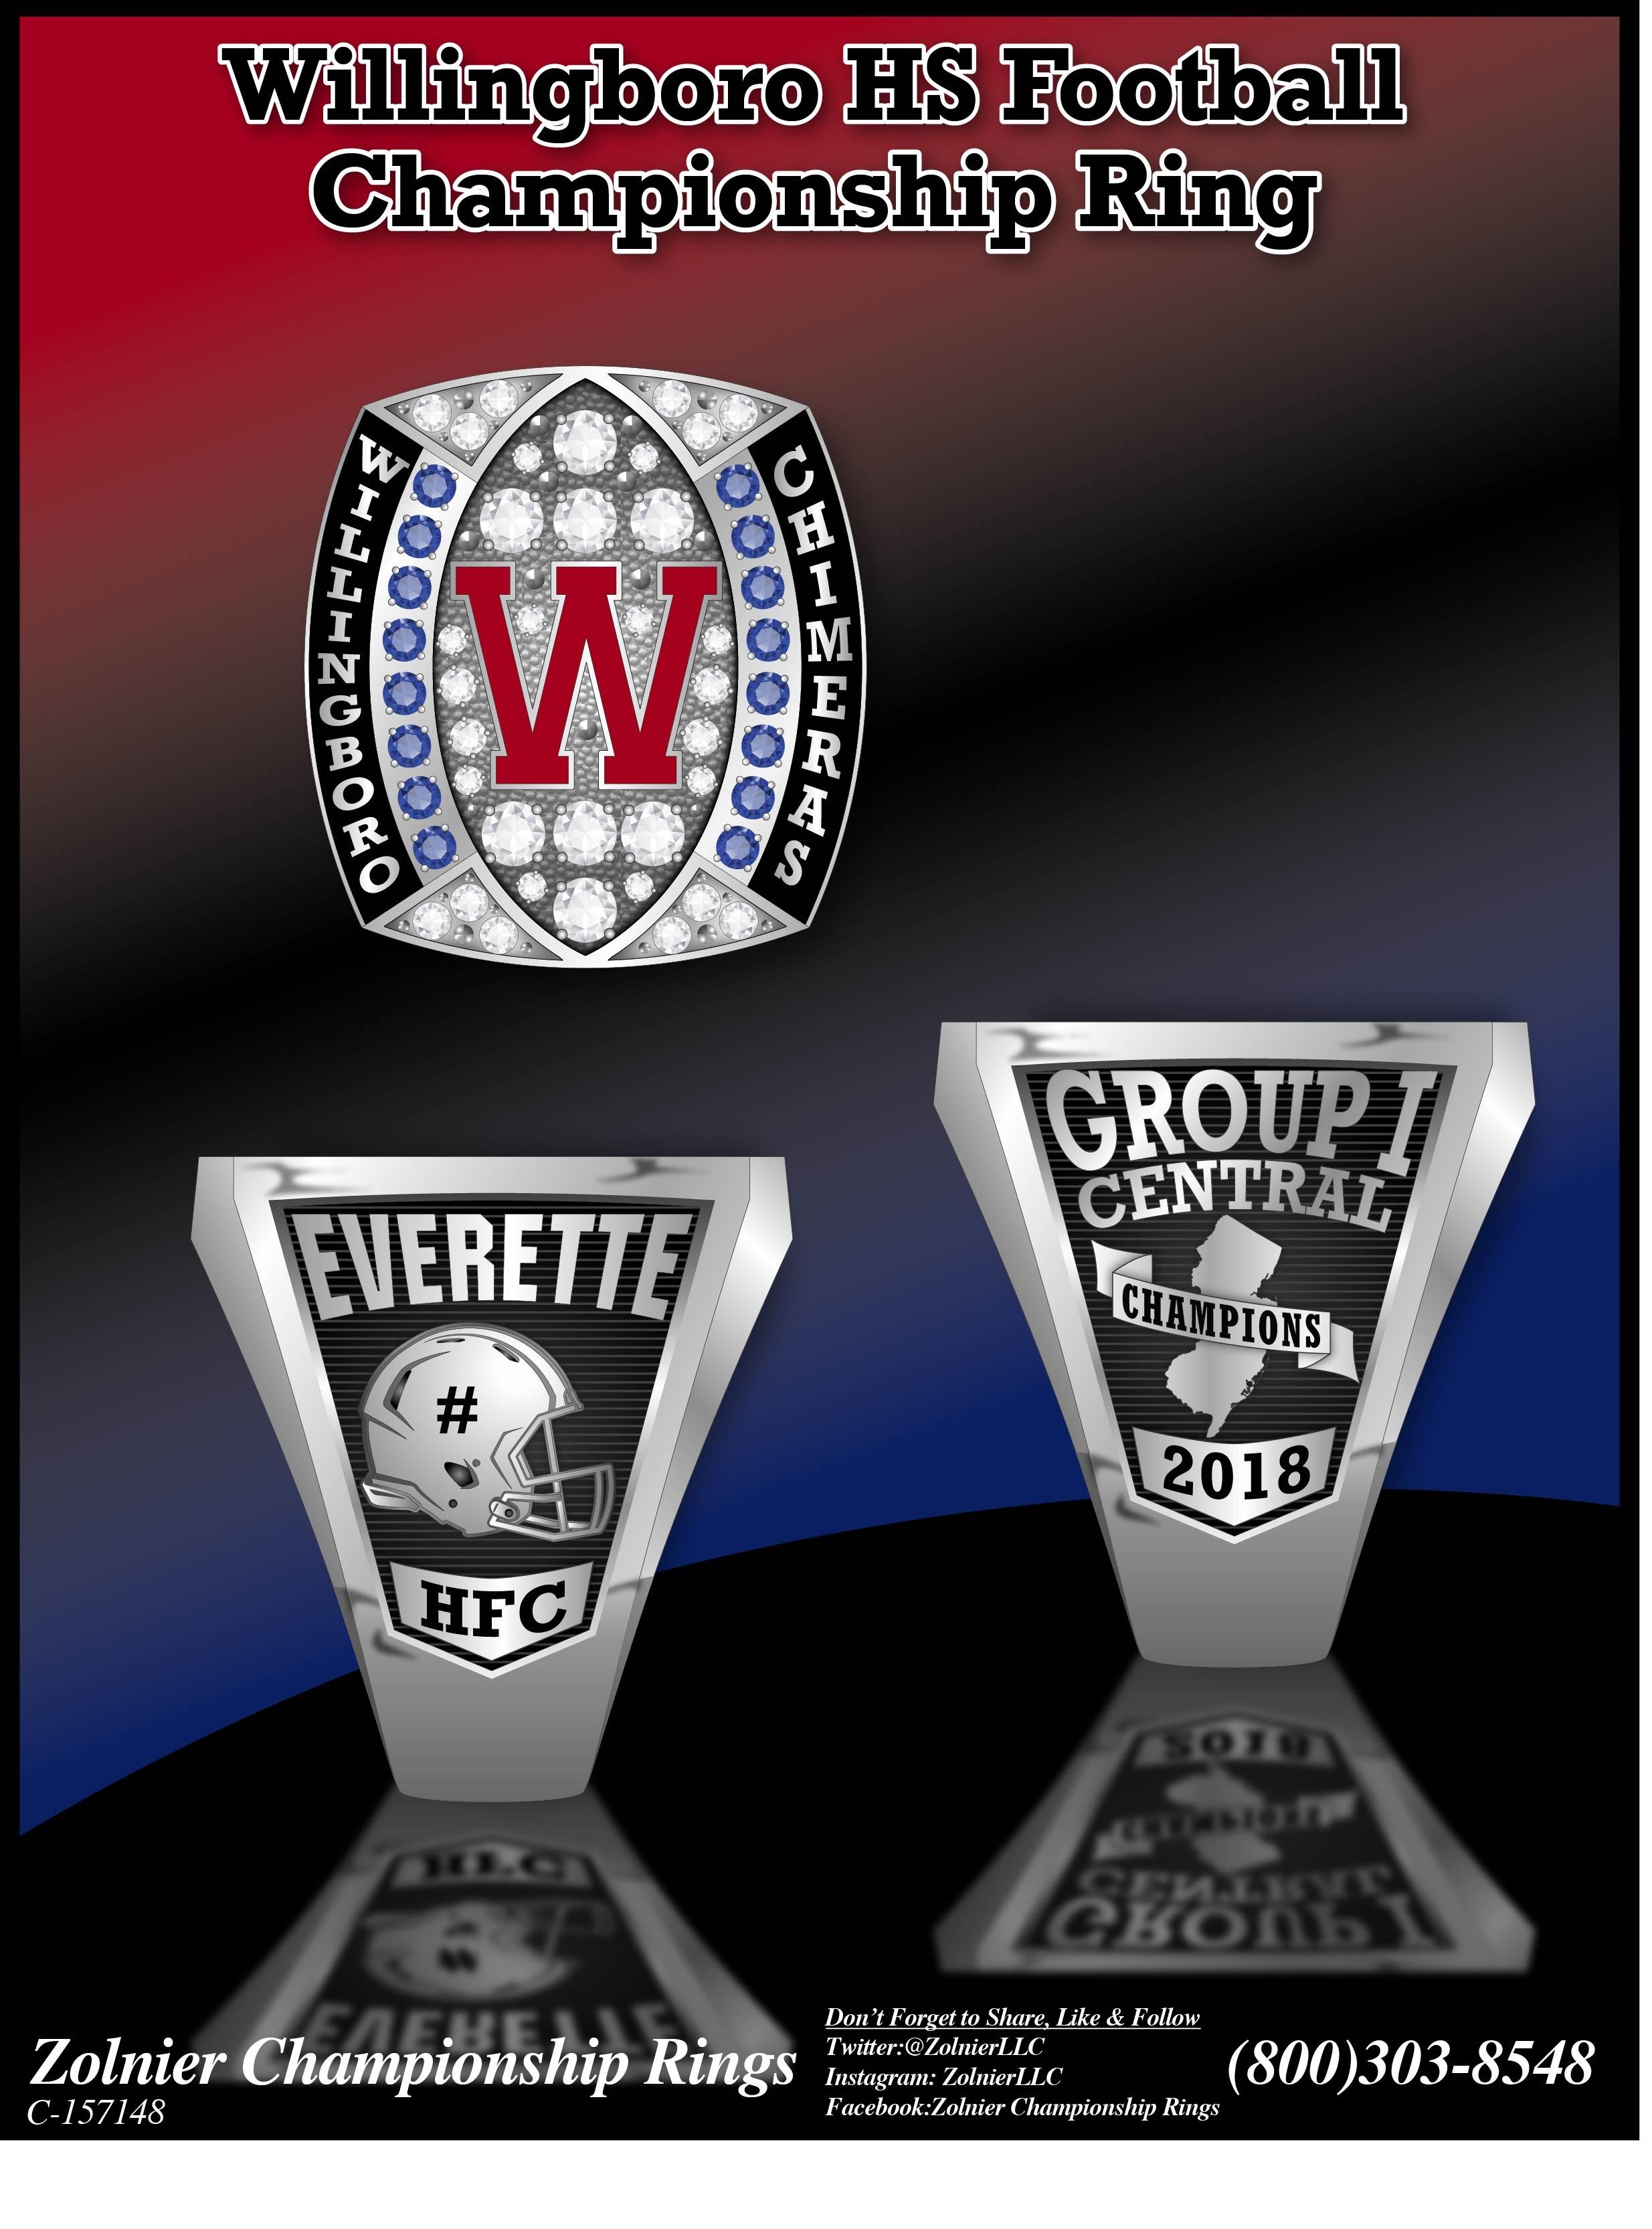 C-157048 Willingboro HS Football Champ Ring